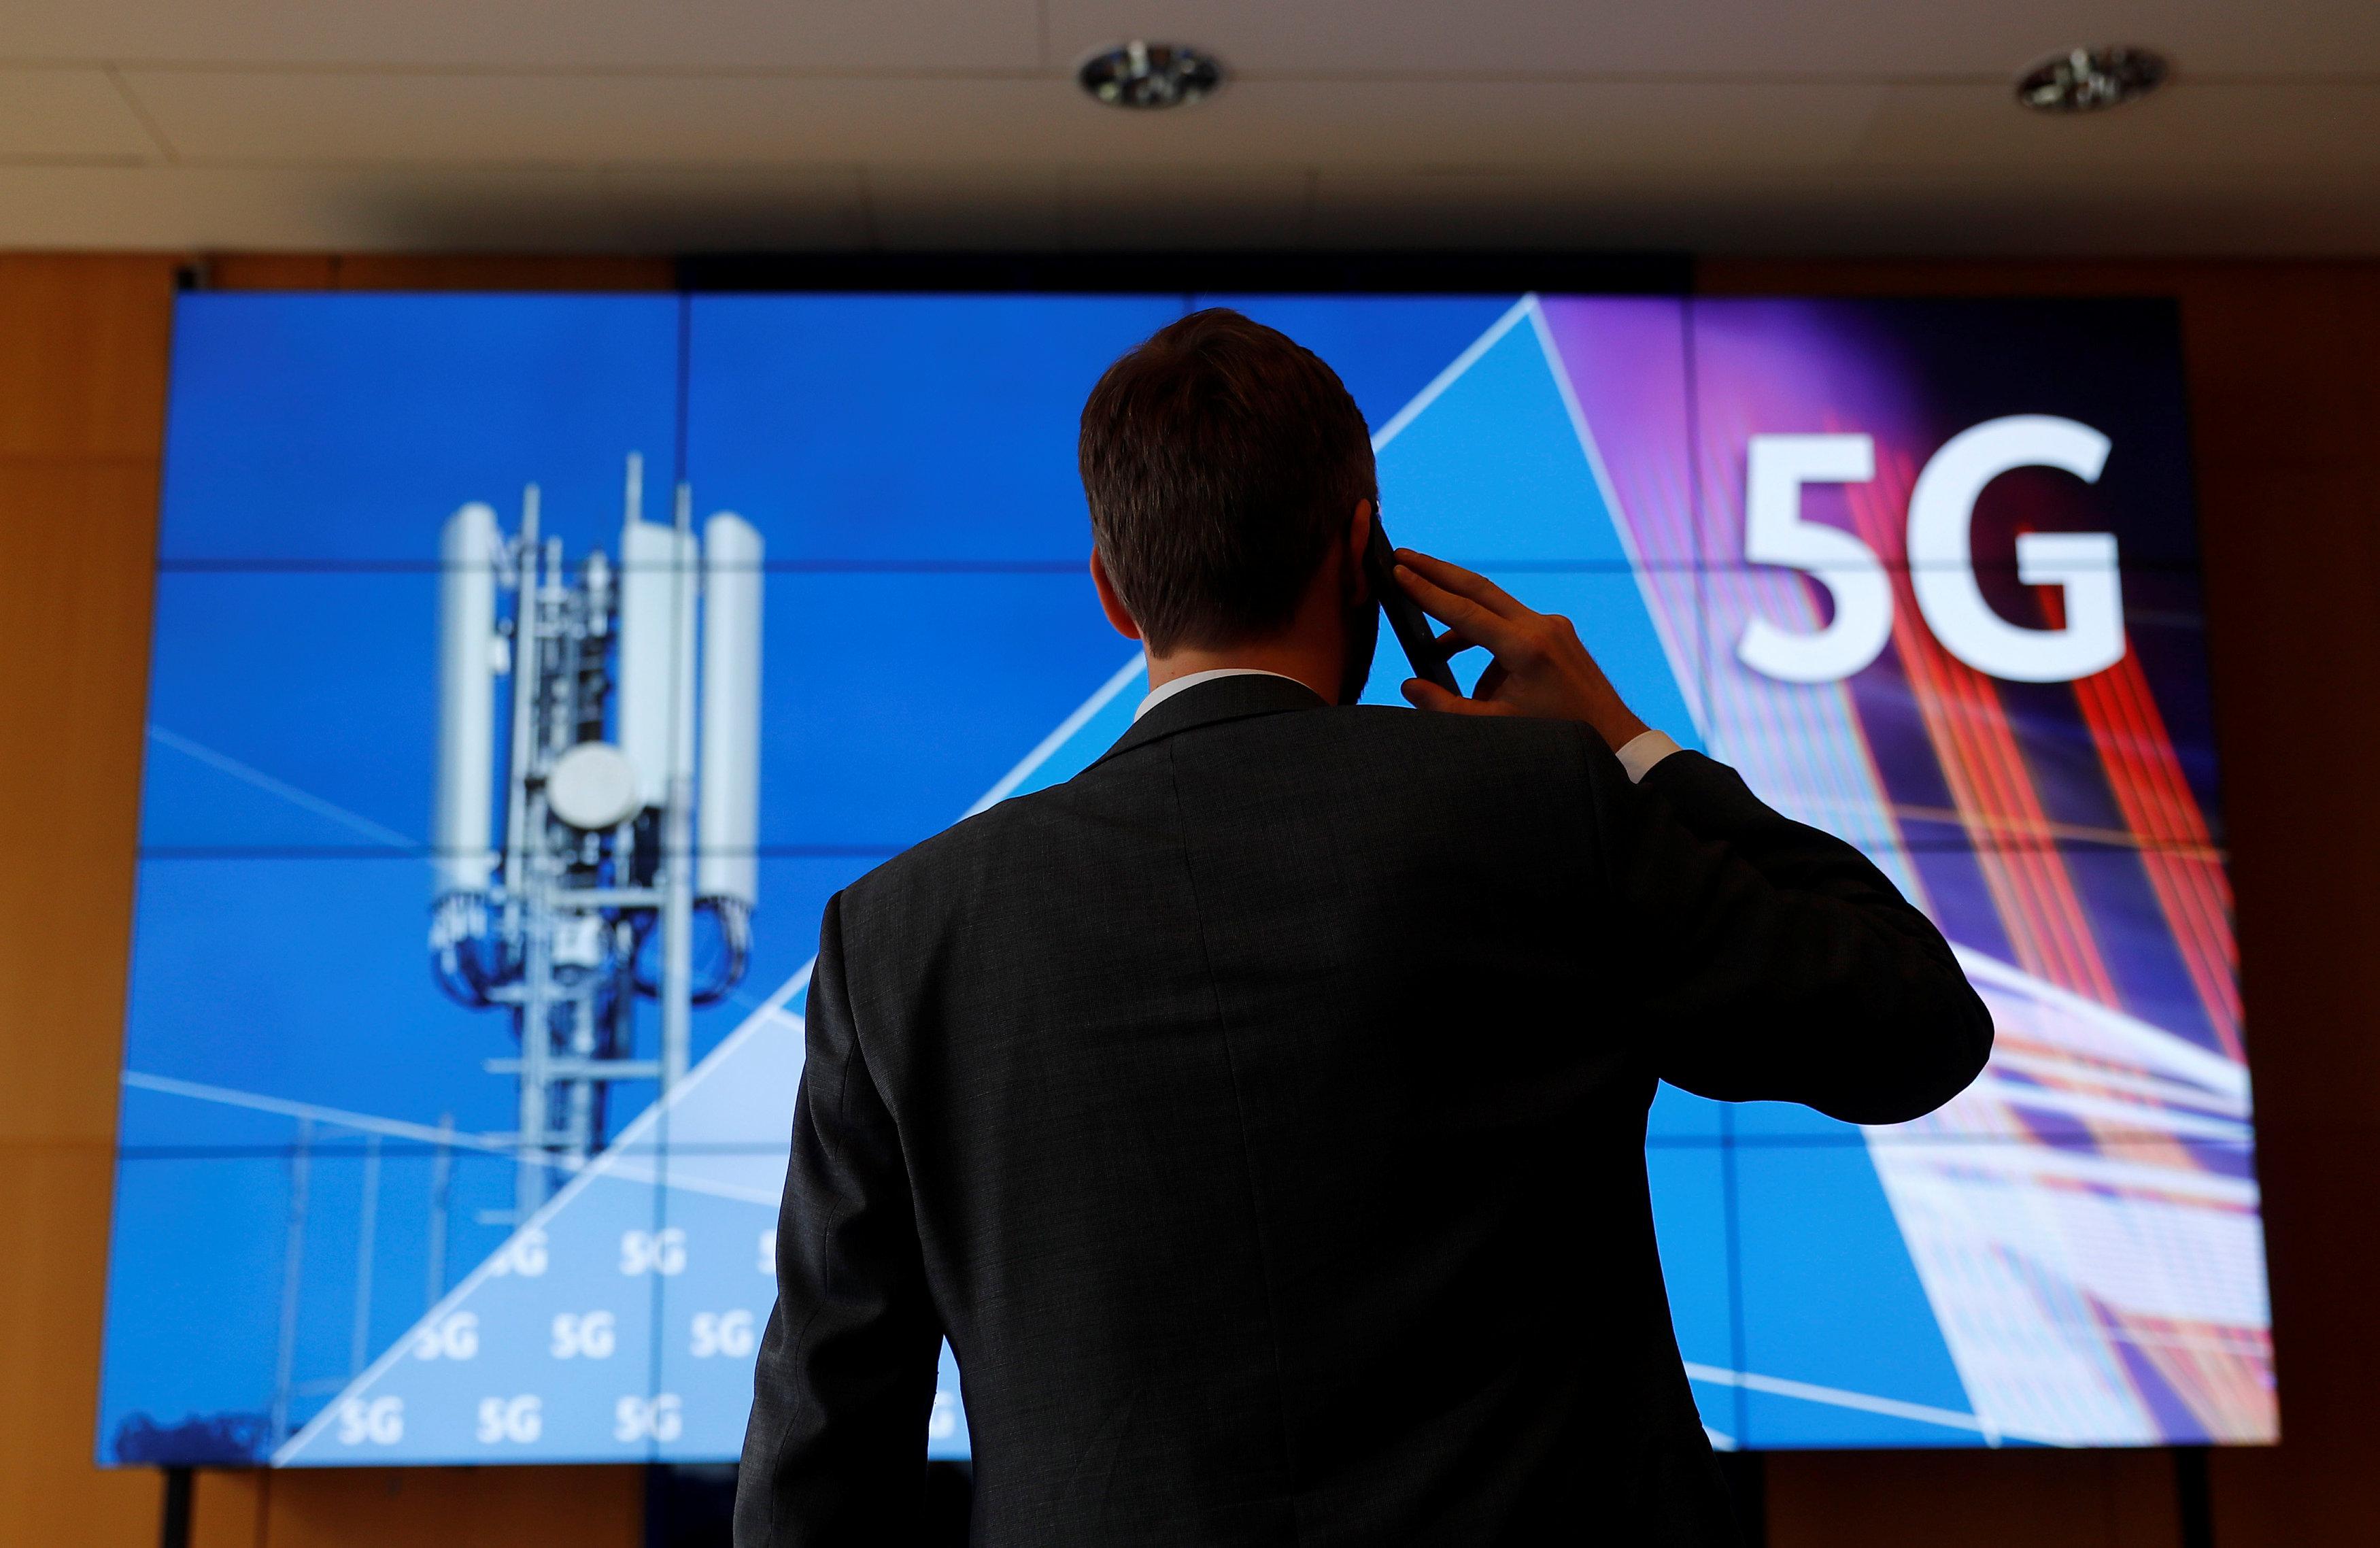 América Móvil elige a Nokia para instalar 5G en Austria